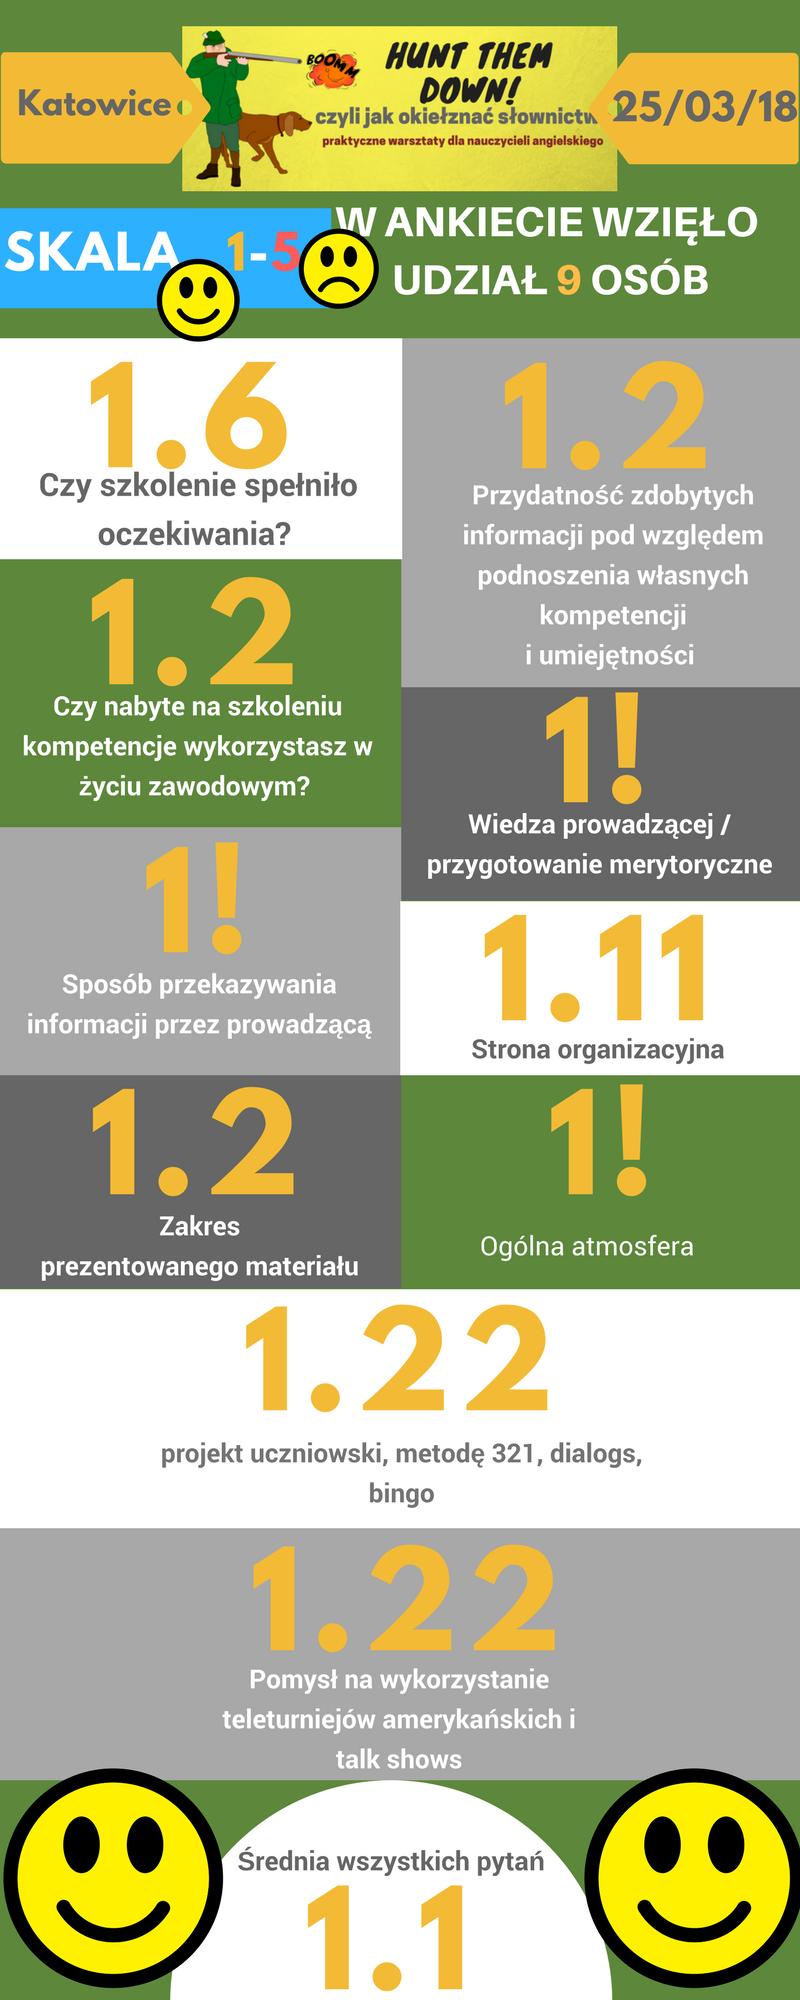 Katowice - nedziela ankieta